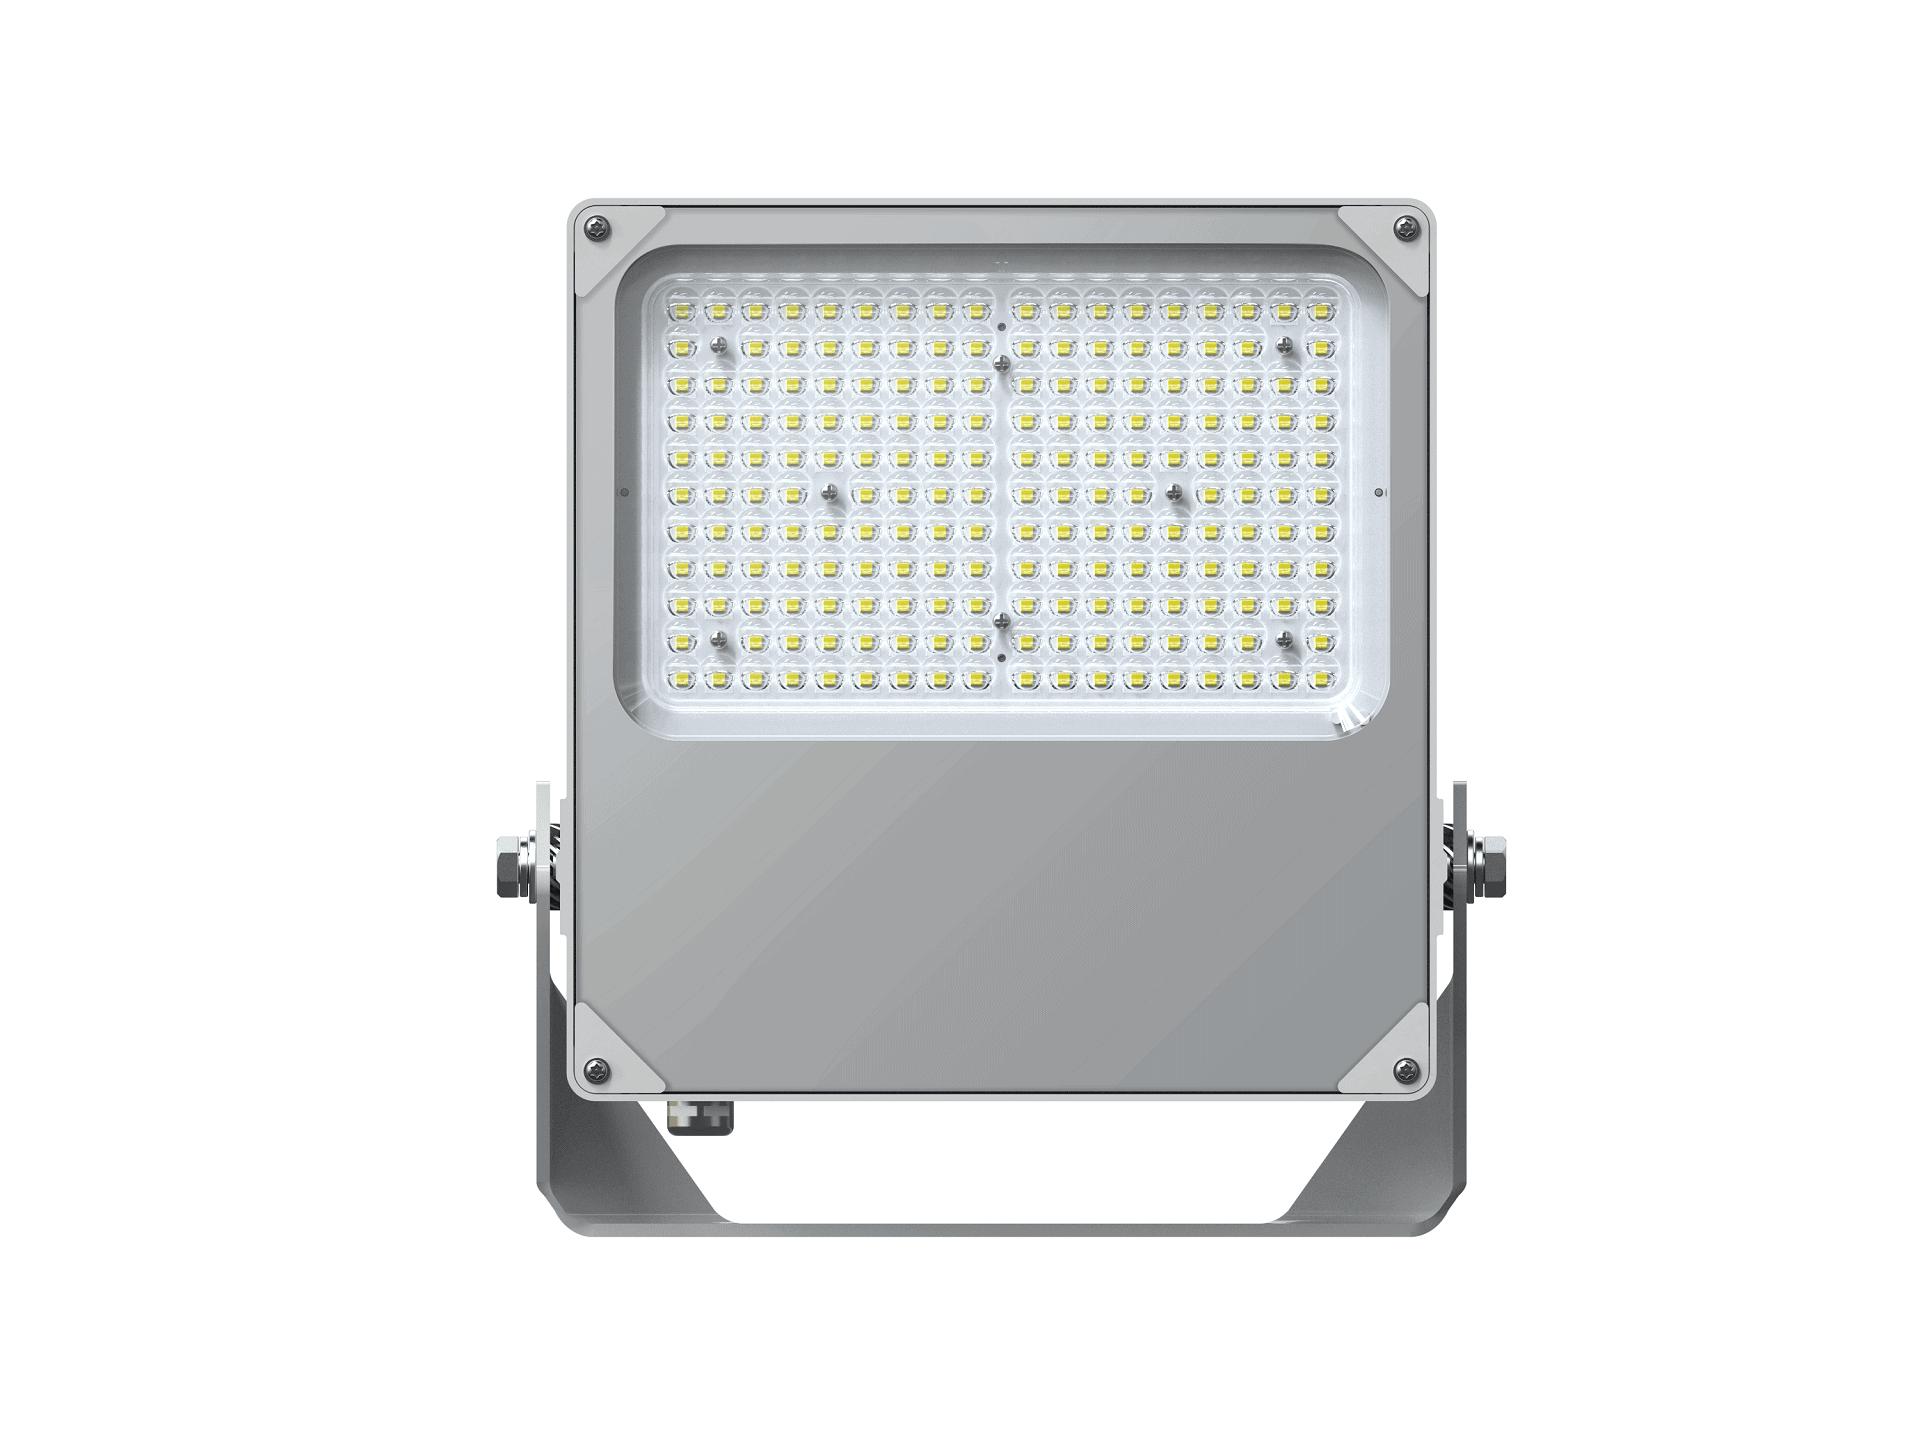 MBL GC 23 Anti korróziós Reflektorok